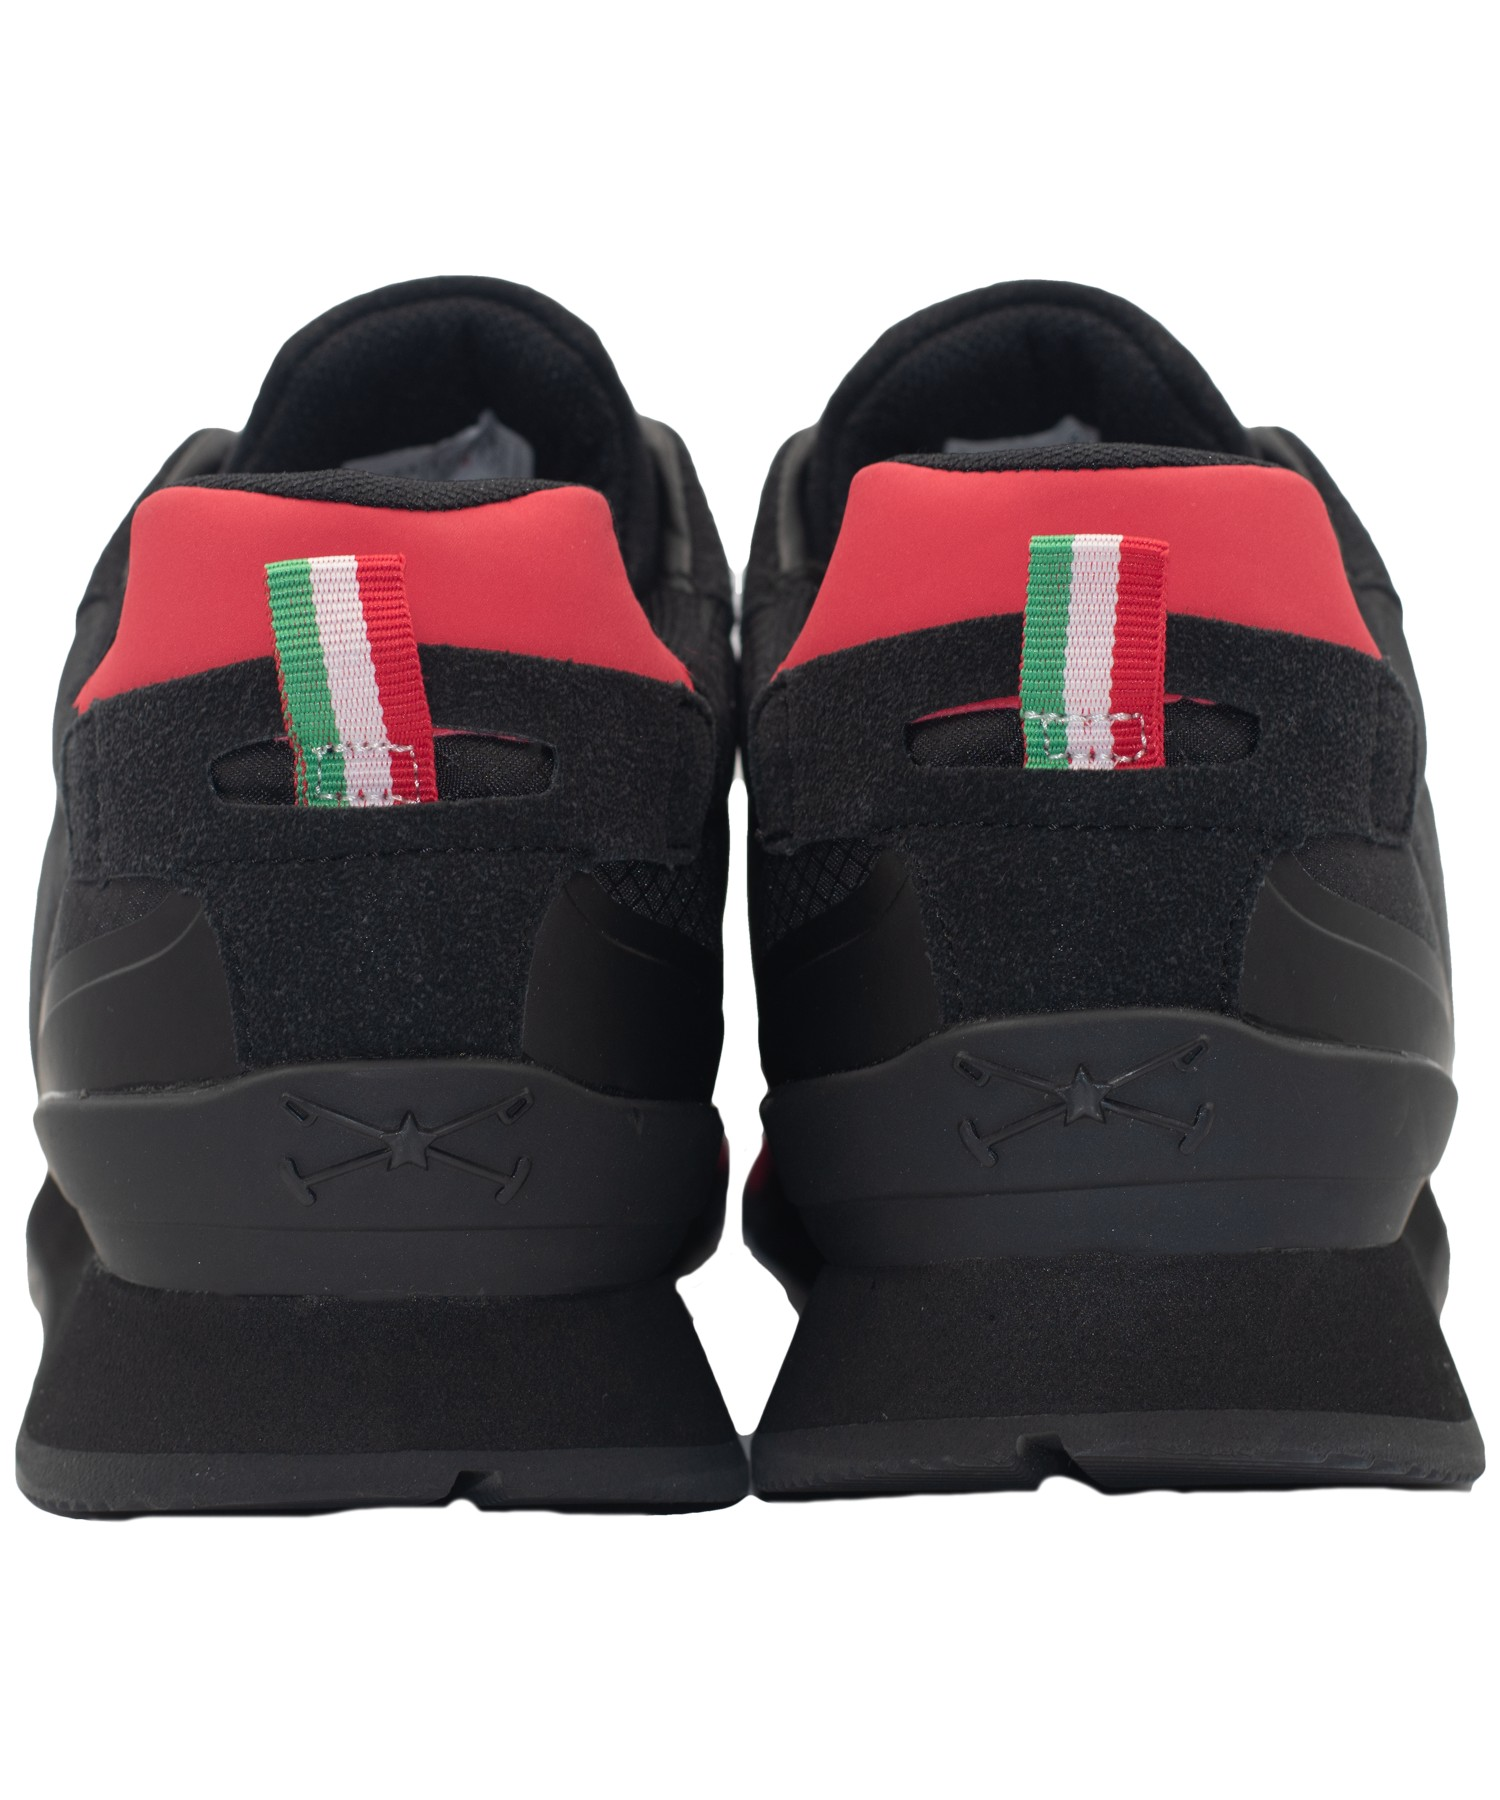 Zapatillas de Hombre Bhpc Bling Negro-Rojo